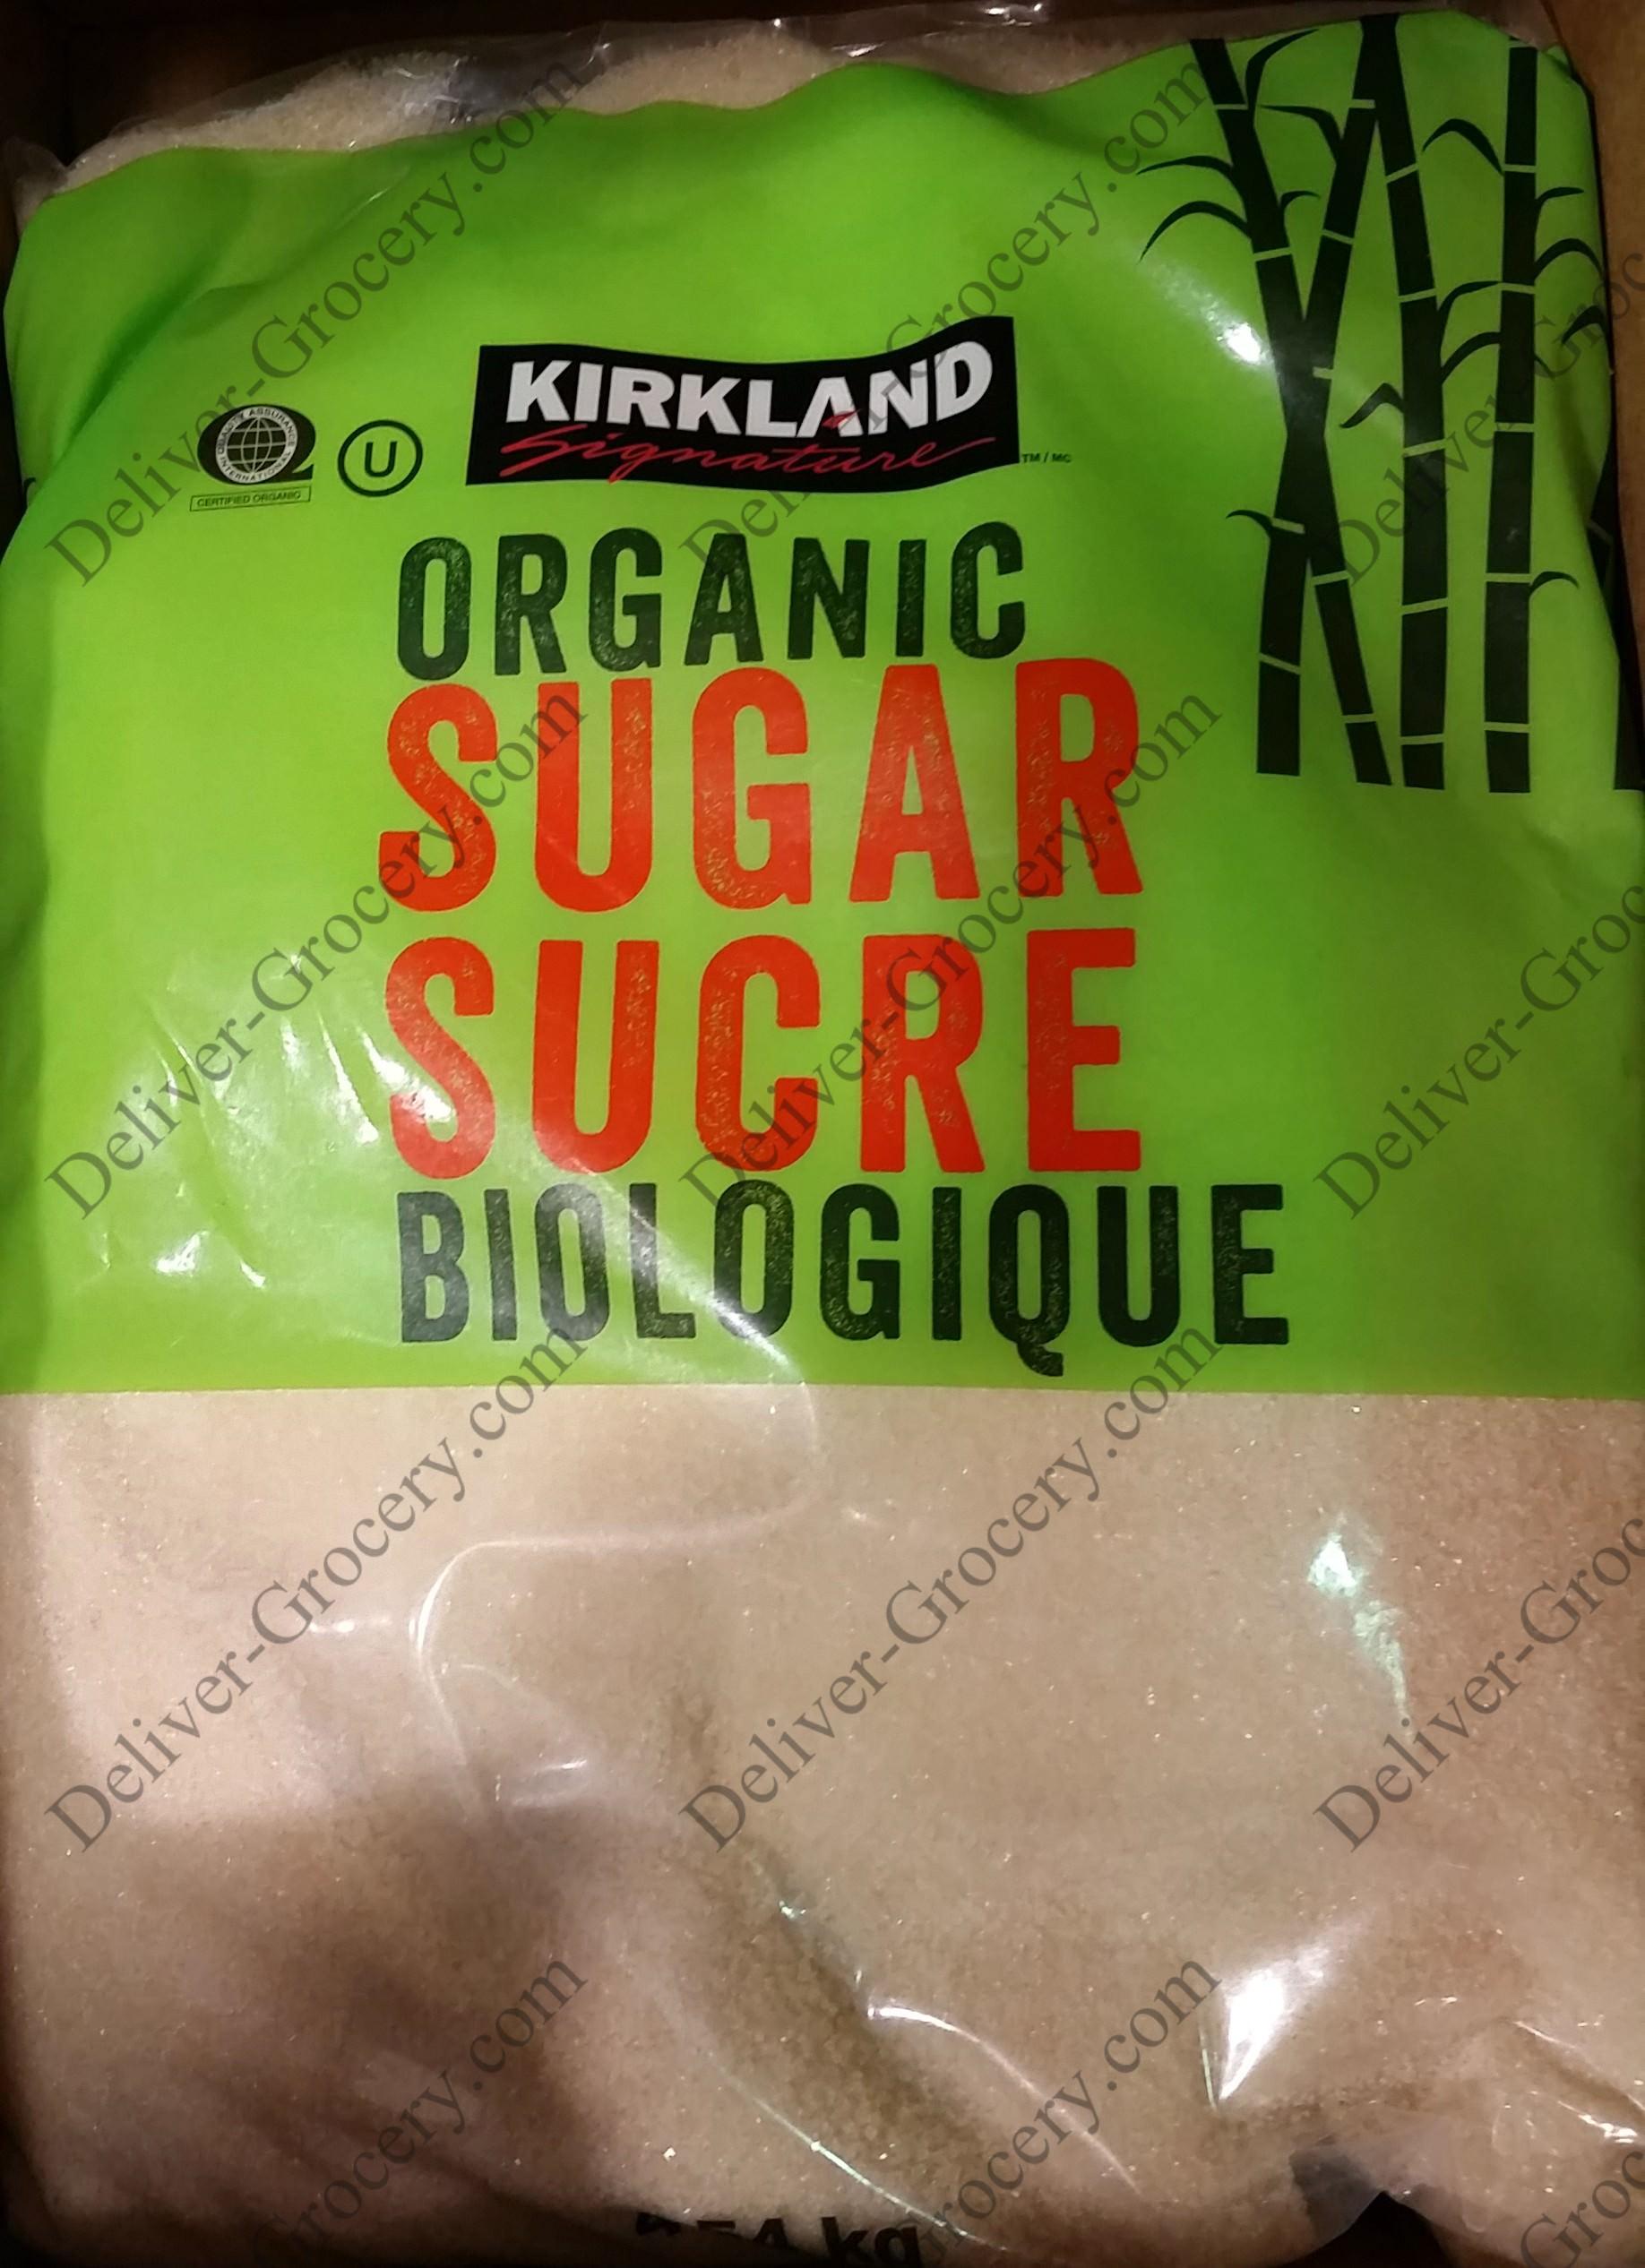 Kirkland Signature Organic Sugar 454 Kg Deliver Grocery Online Pure Green Rice Long Grain 1